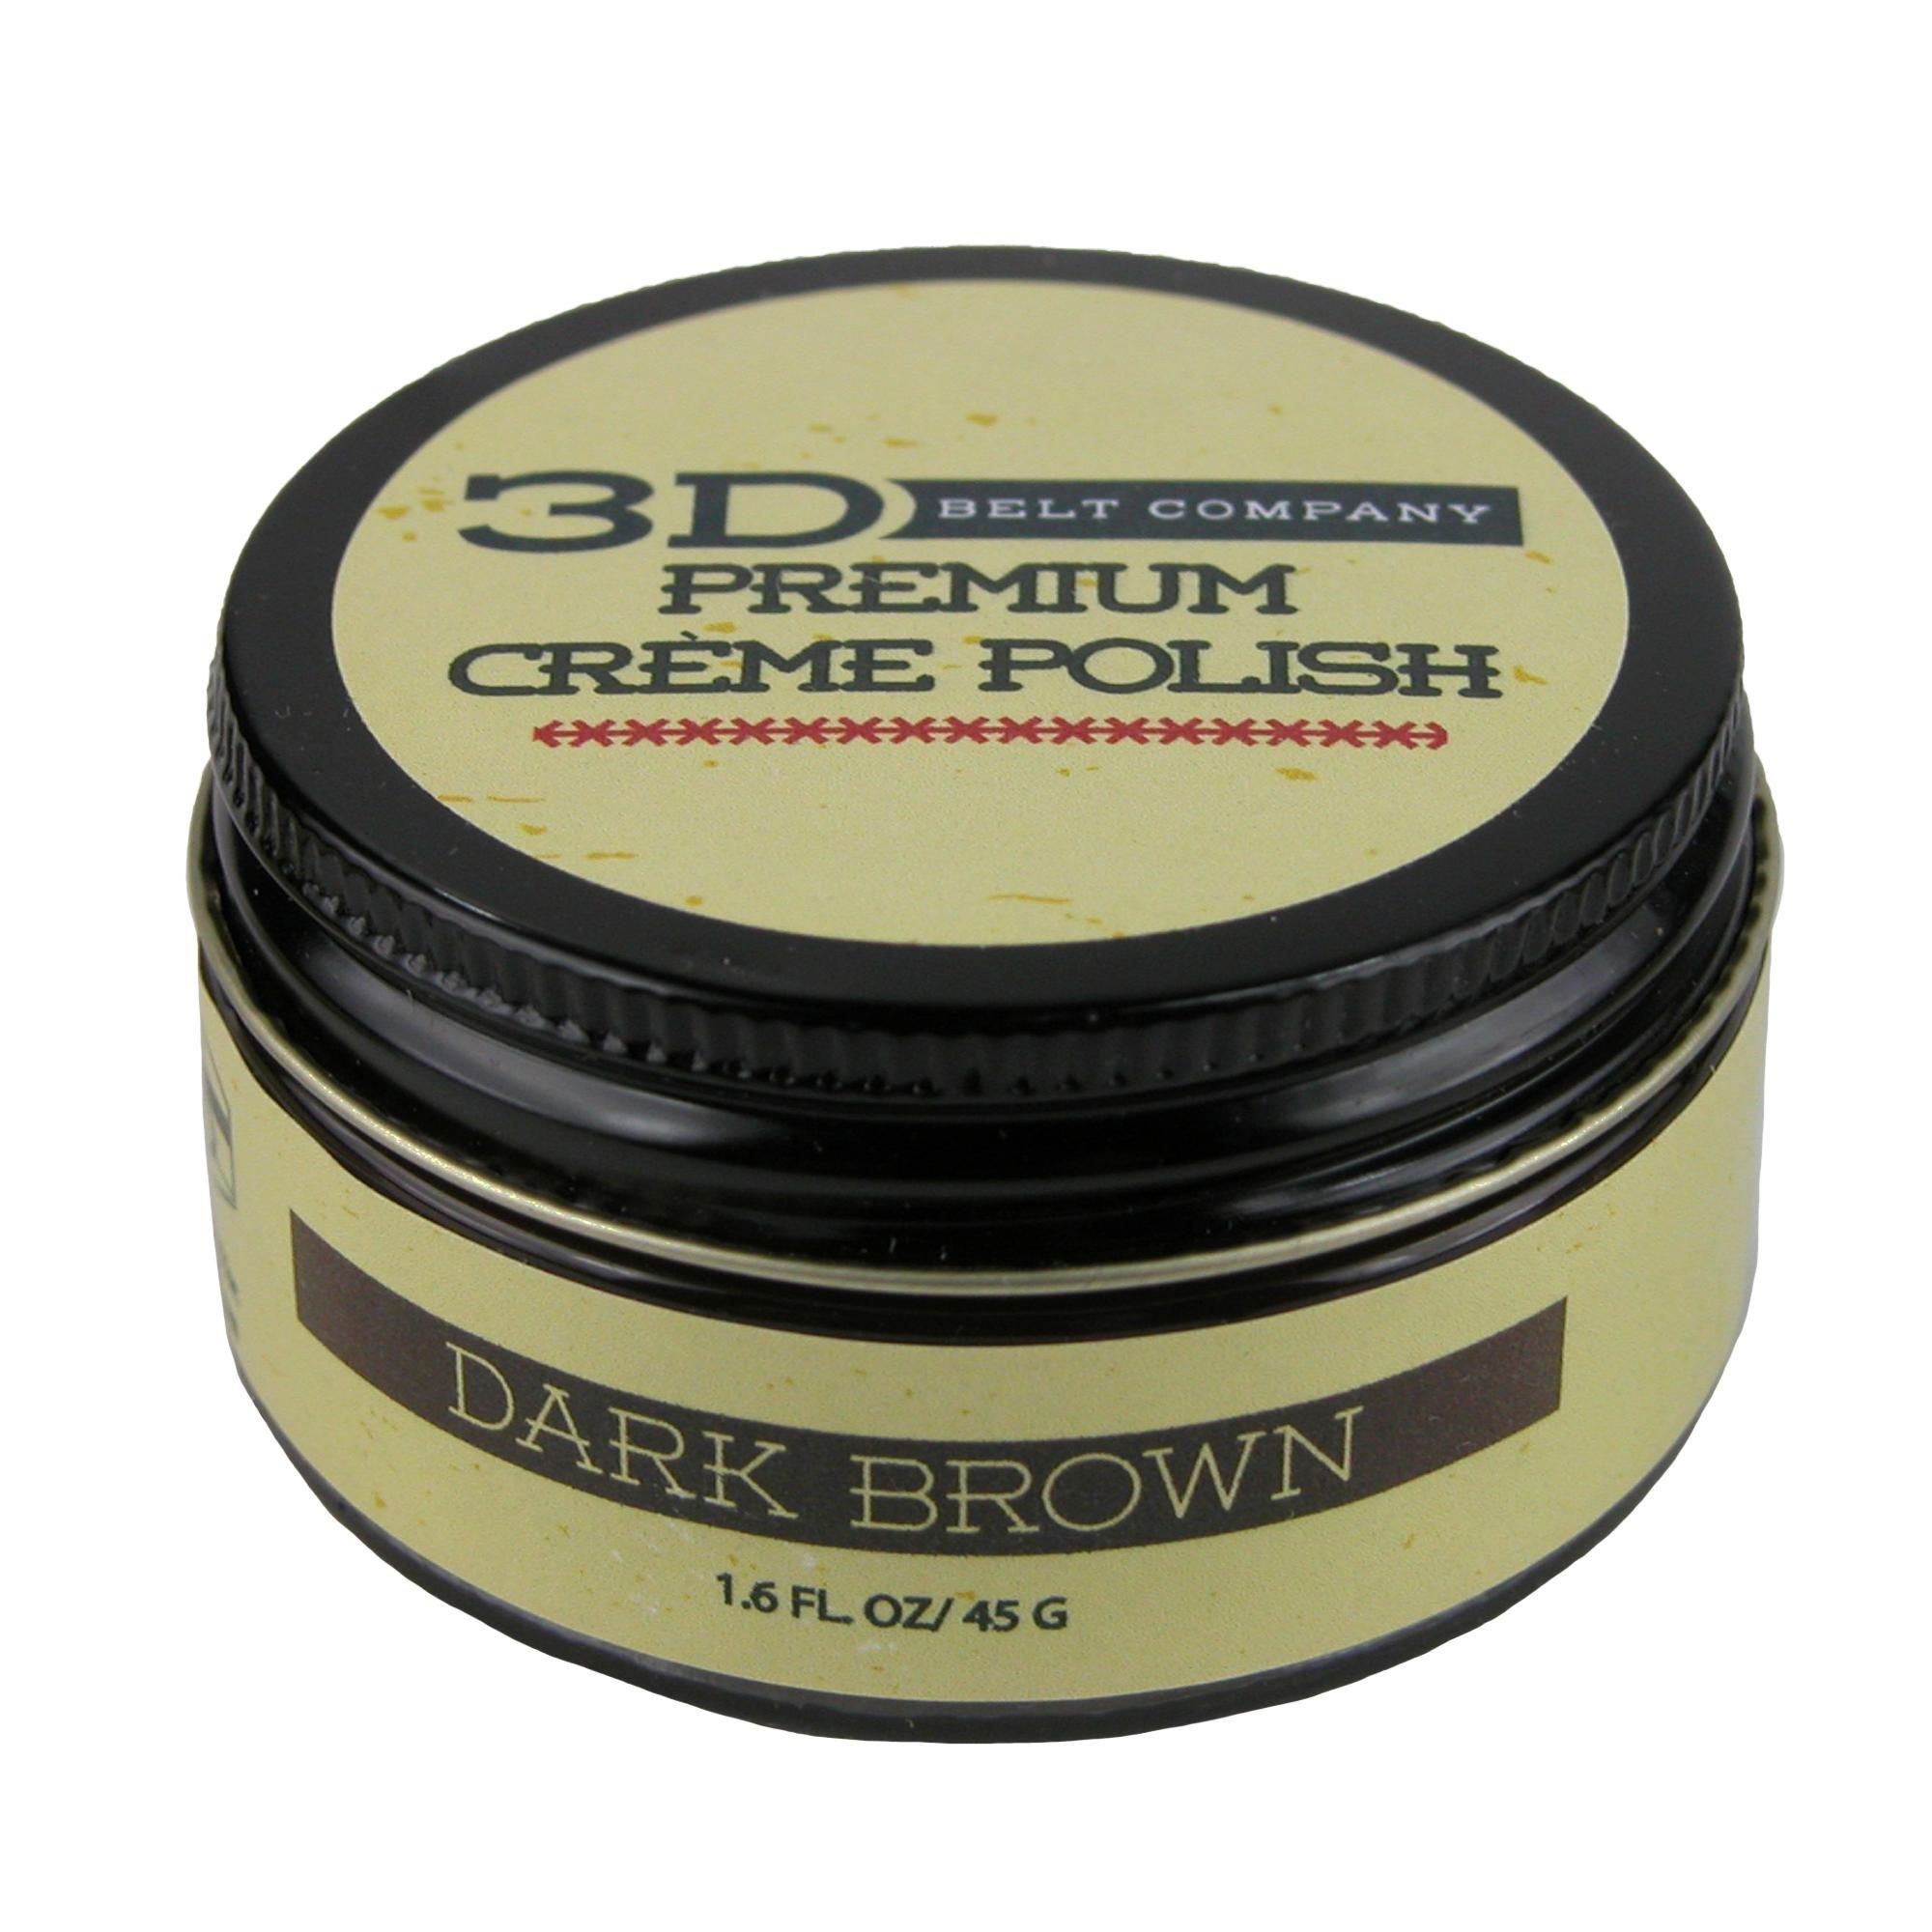 3 D Belt Company 1.6 oz. Creme Leather Polish, Dark Brown